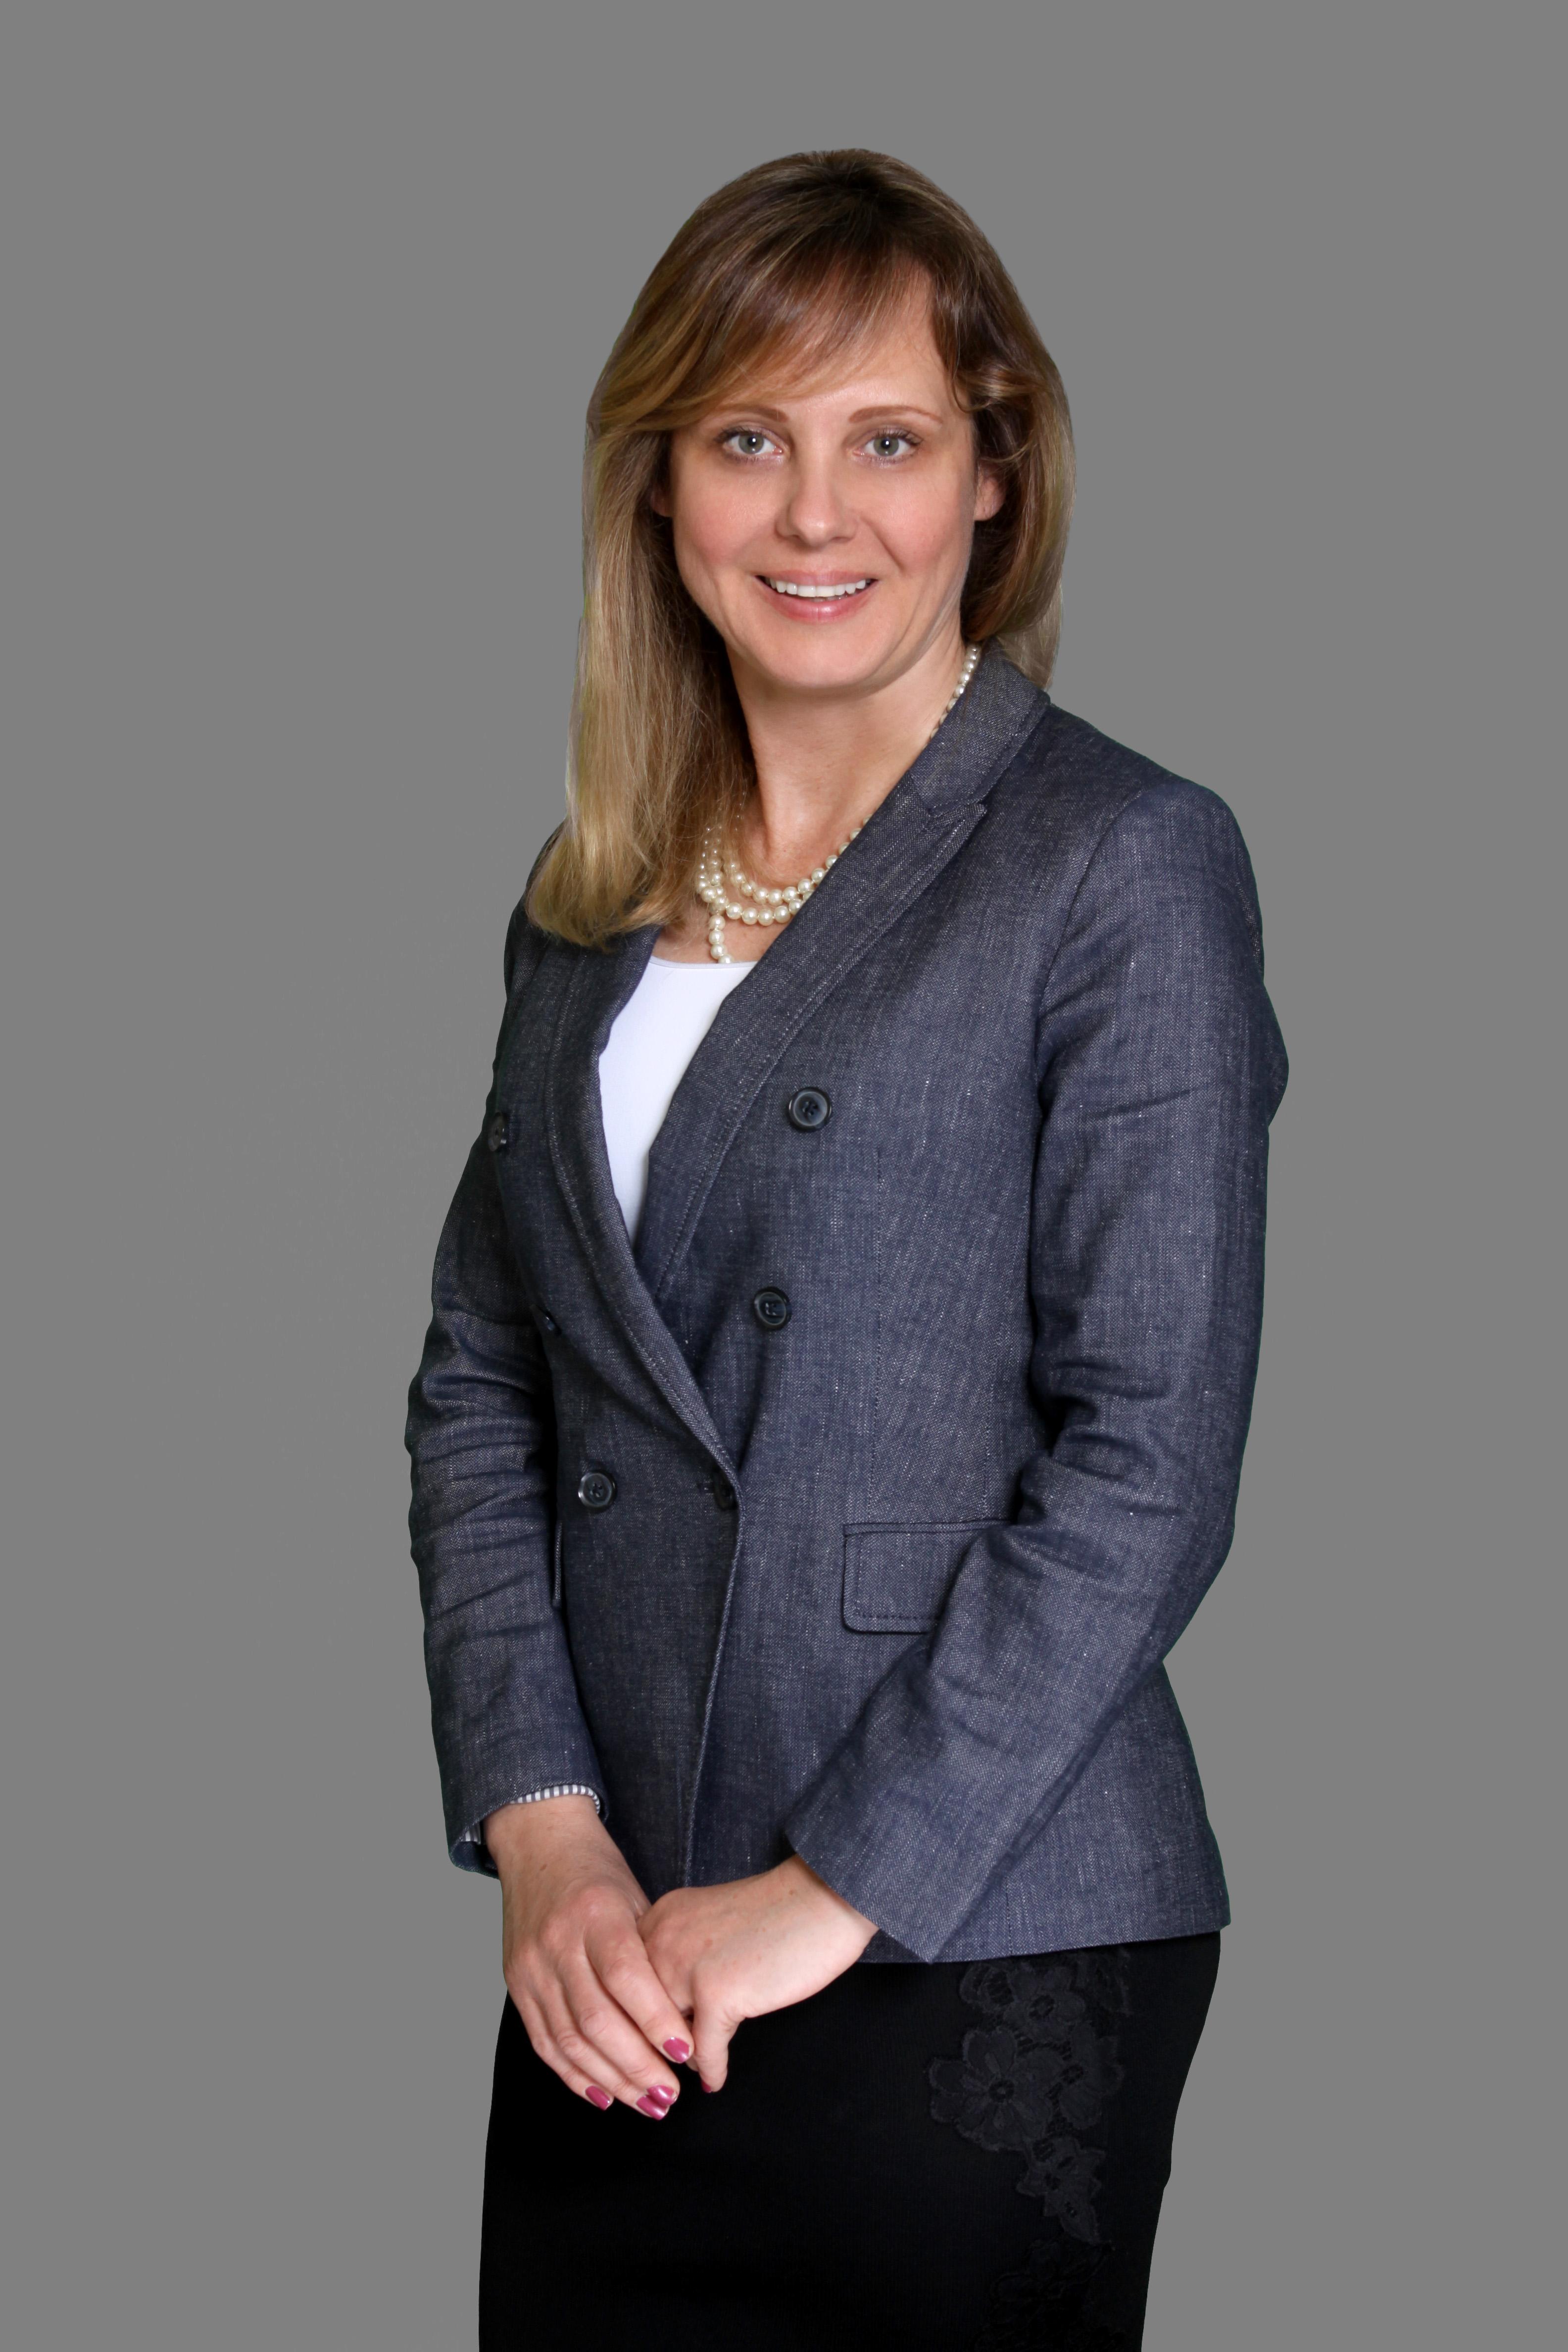 Dorota Paziewska